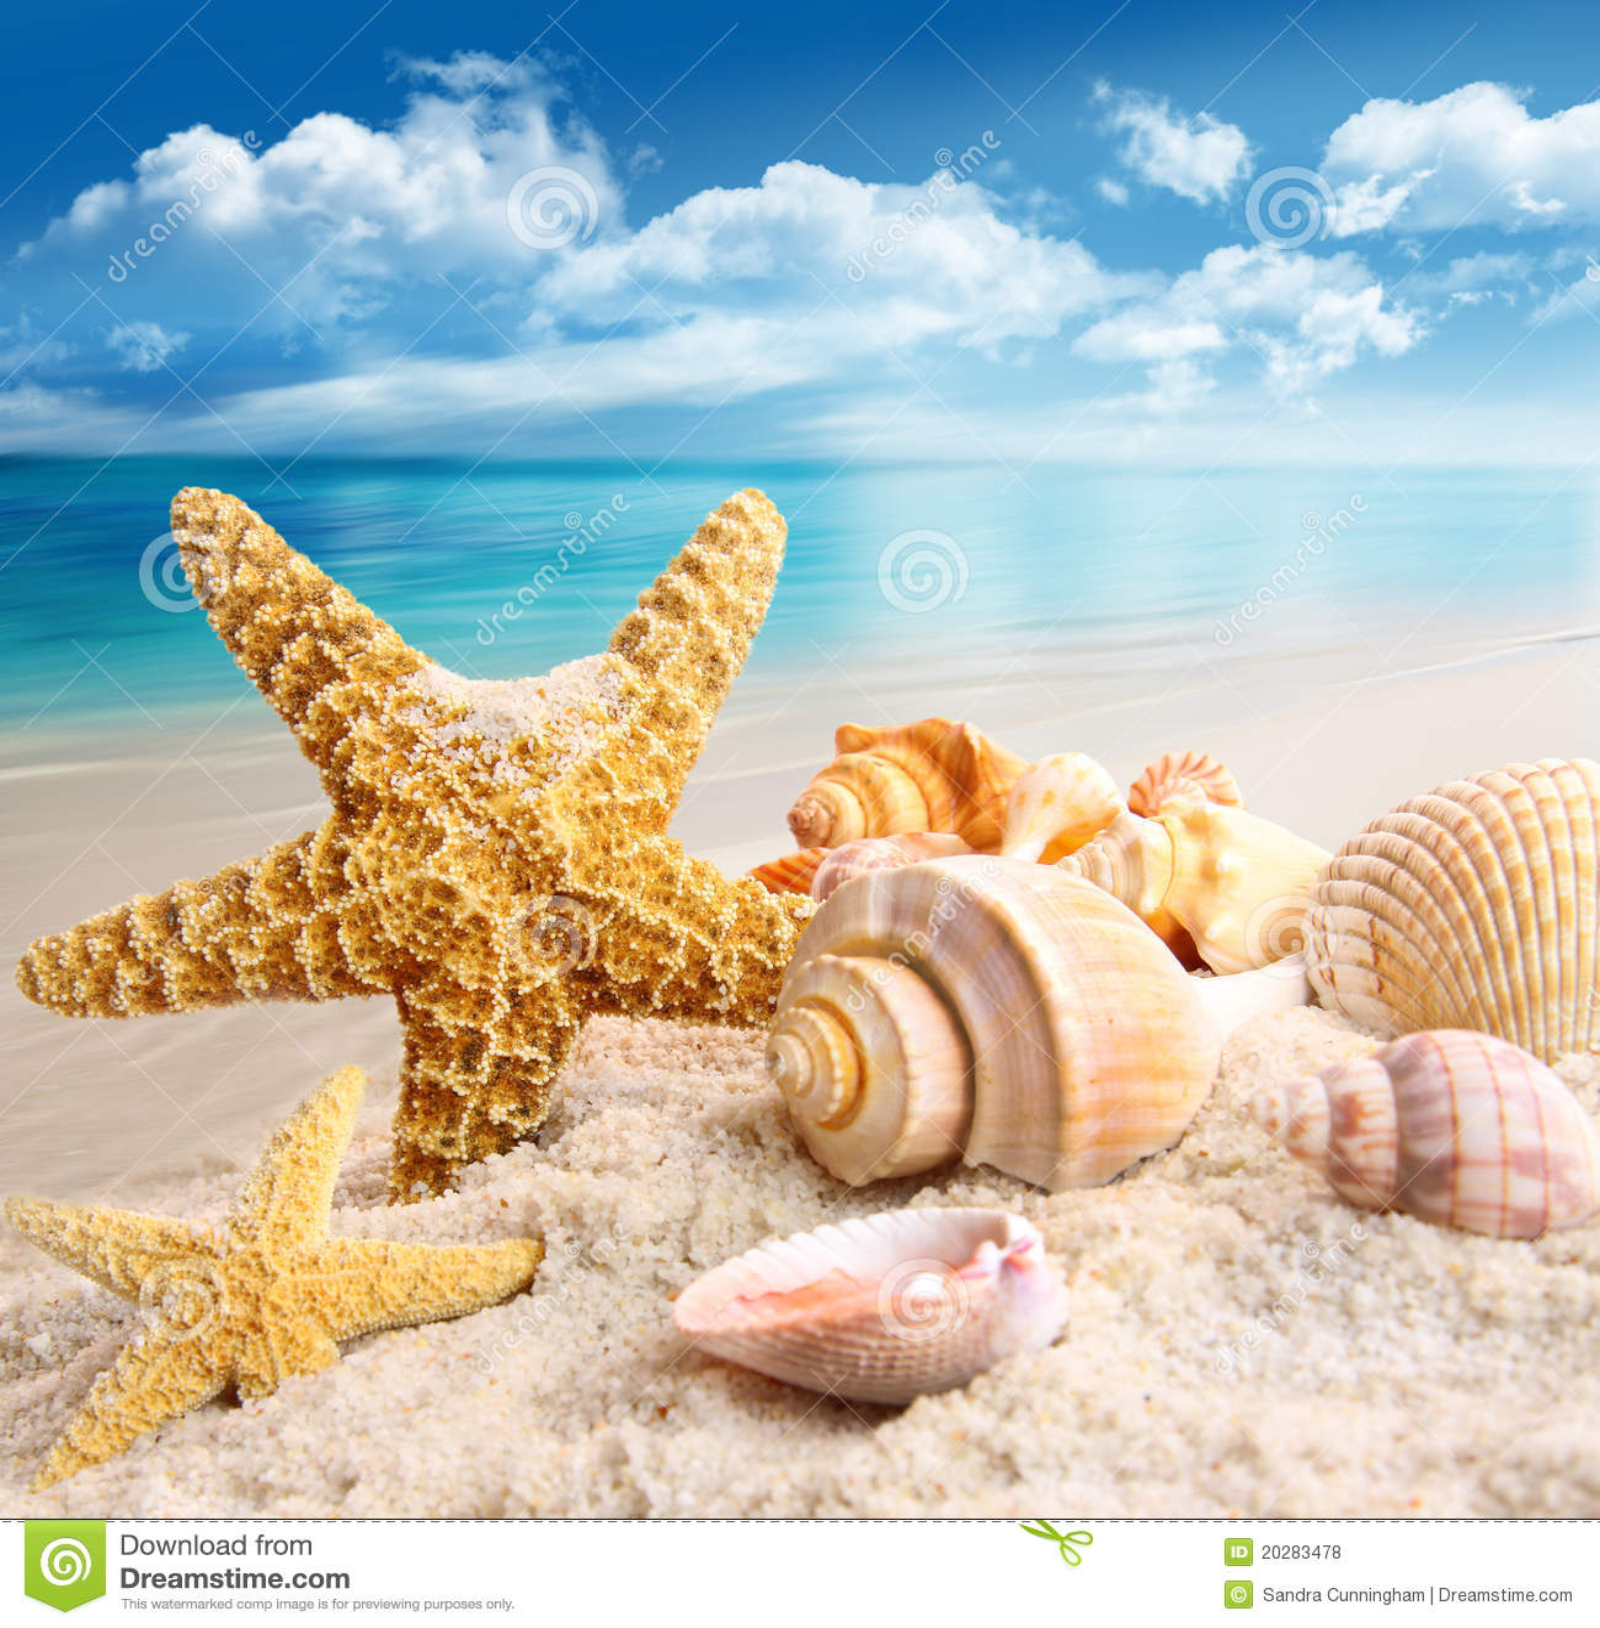 royalty free stock photos starfish seashells beach image